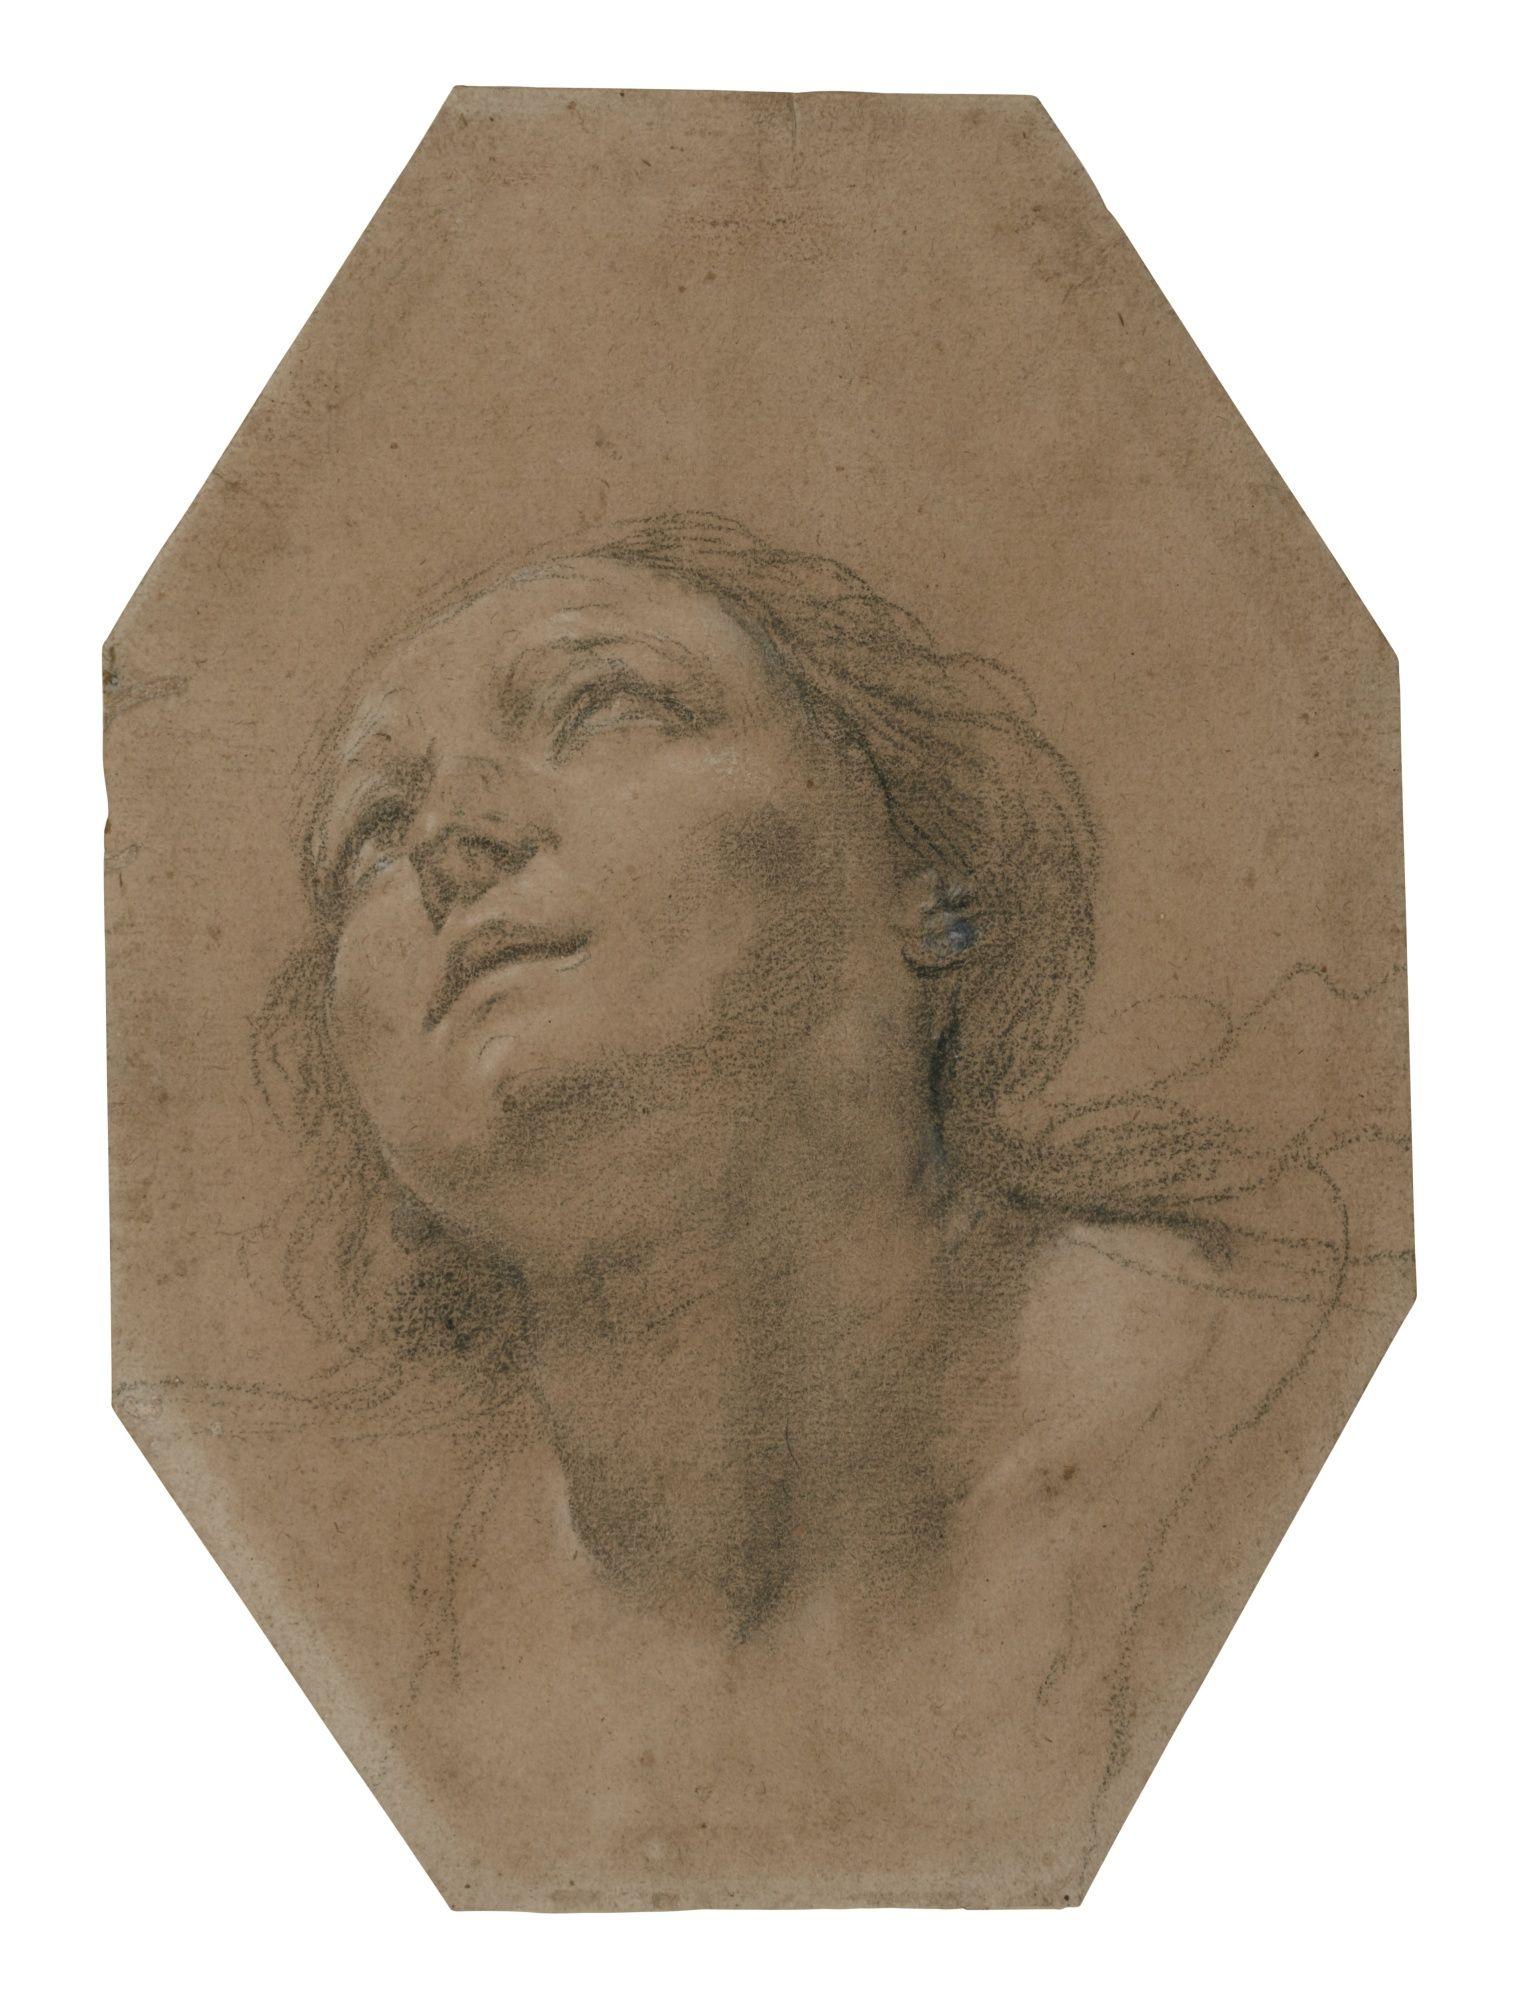 preti, mattia head of ||| portrait - female ||| sotheby's l16040lot8txlfen